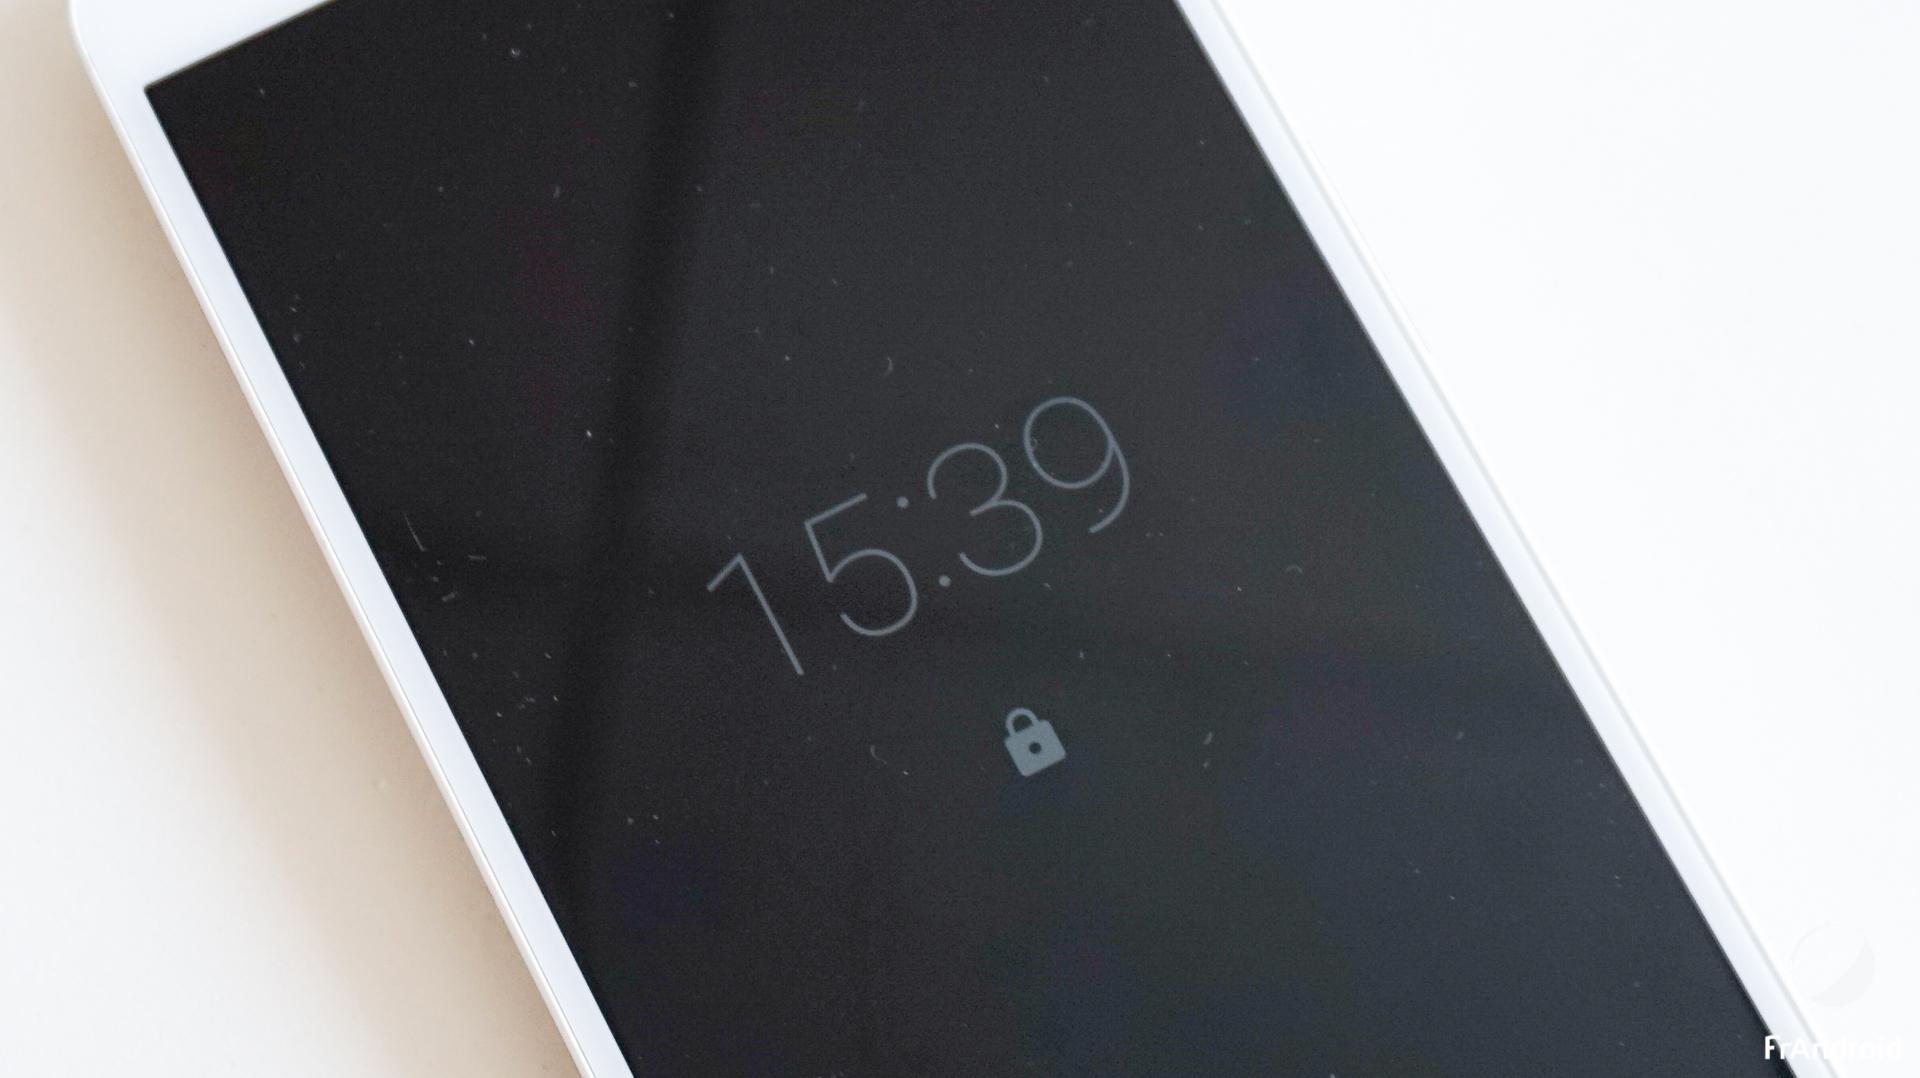 GalaxyS7 : le mode «Always On Display» breveté par Samsung